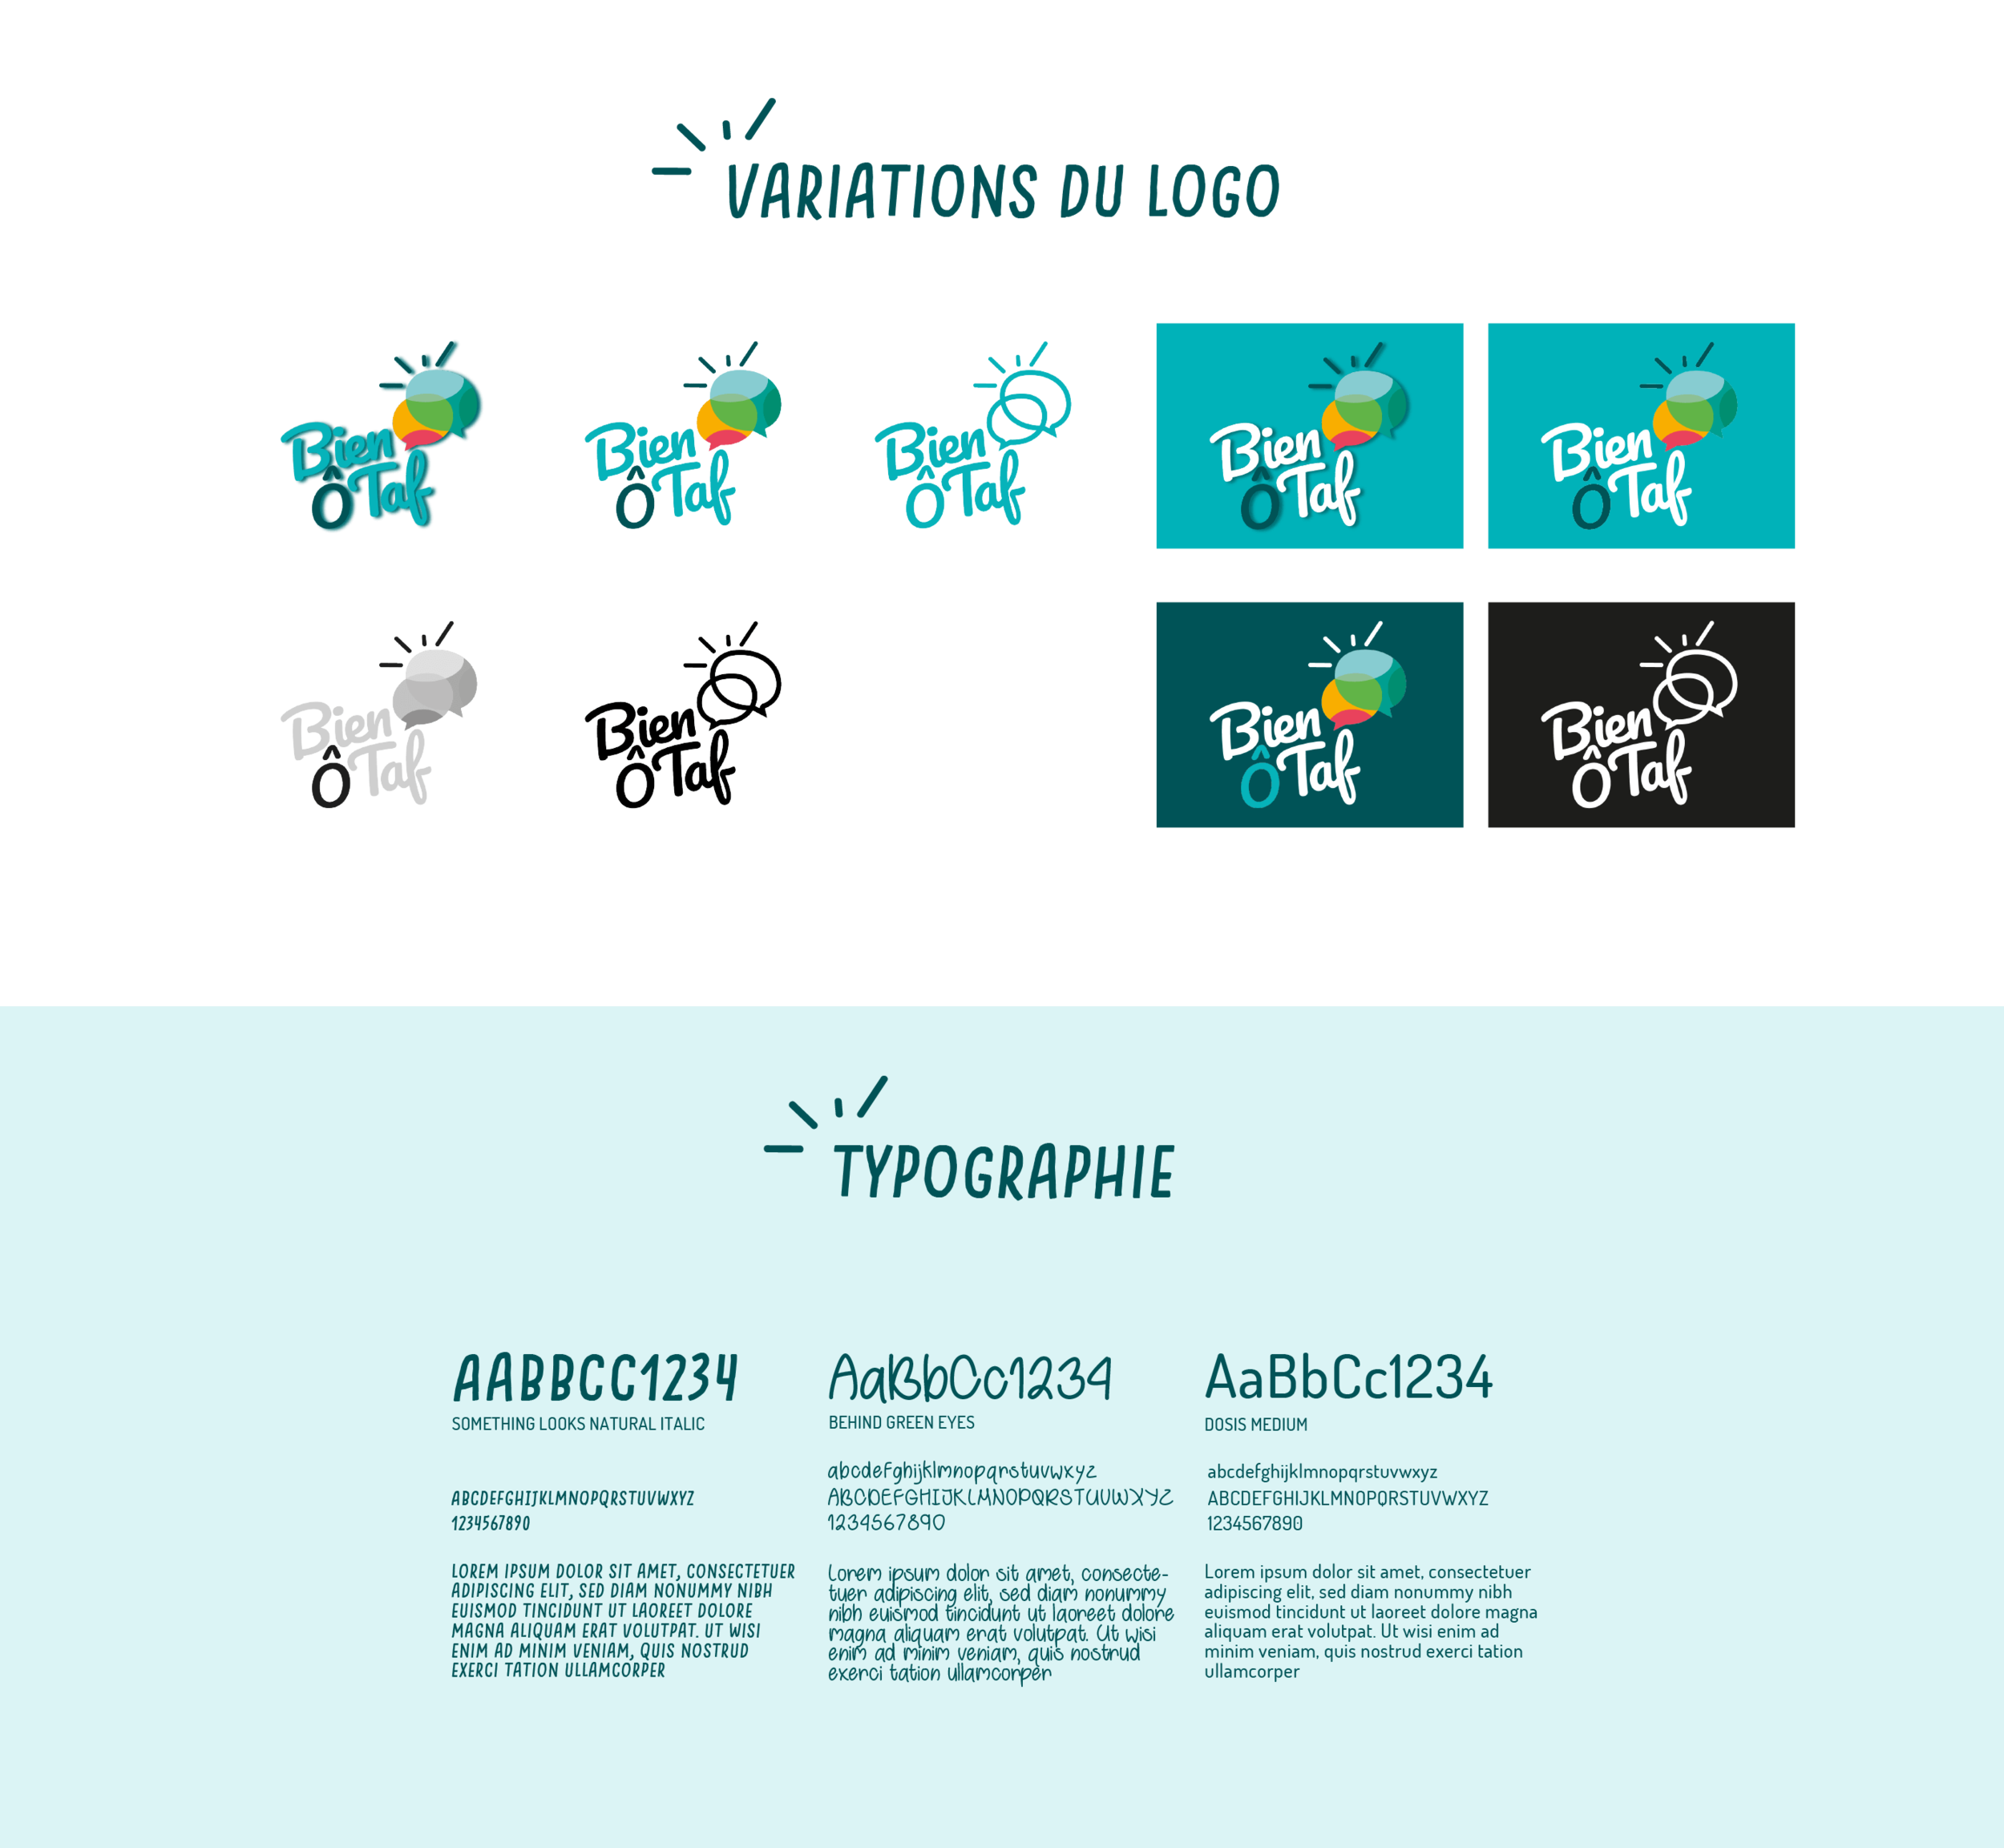 bienotaf_identite_visuelle_design_graphique_variations_du_logo_typographie_choisie.png